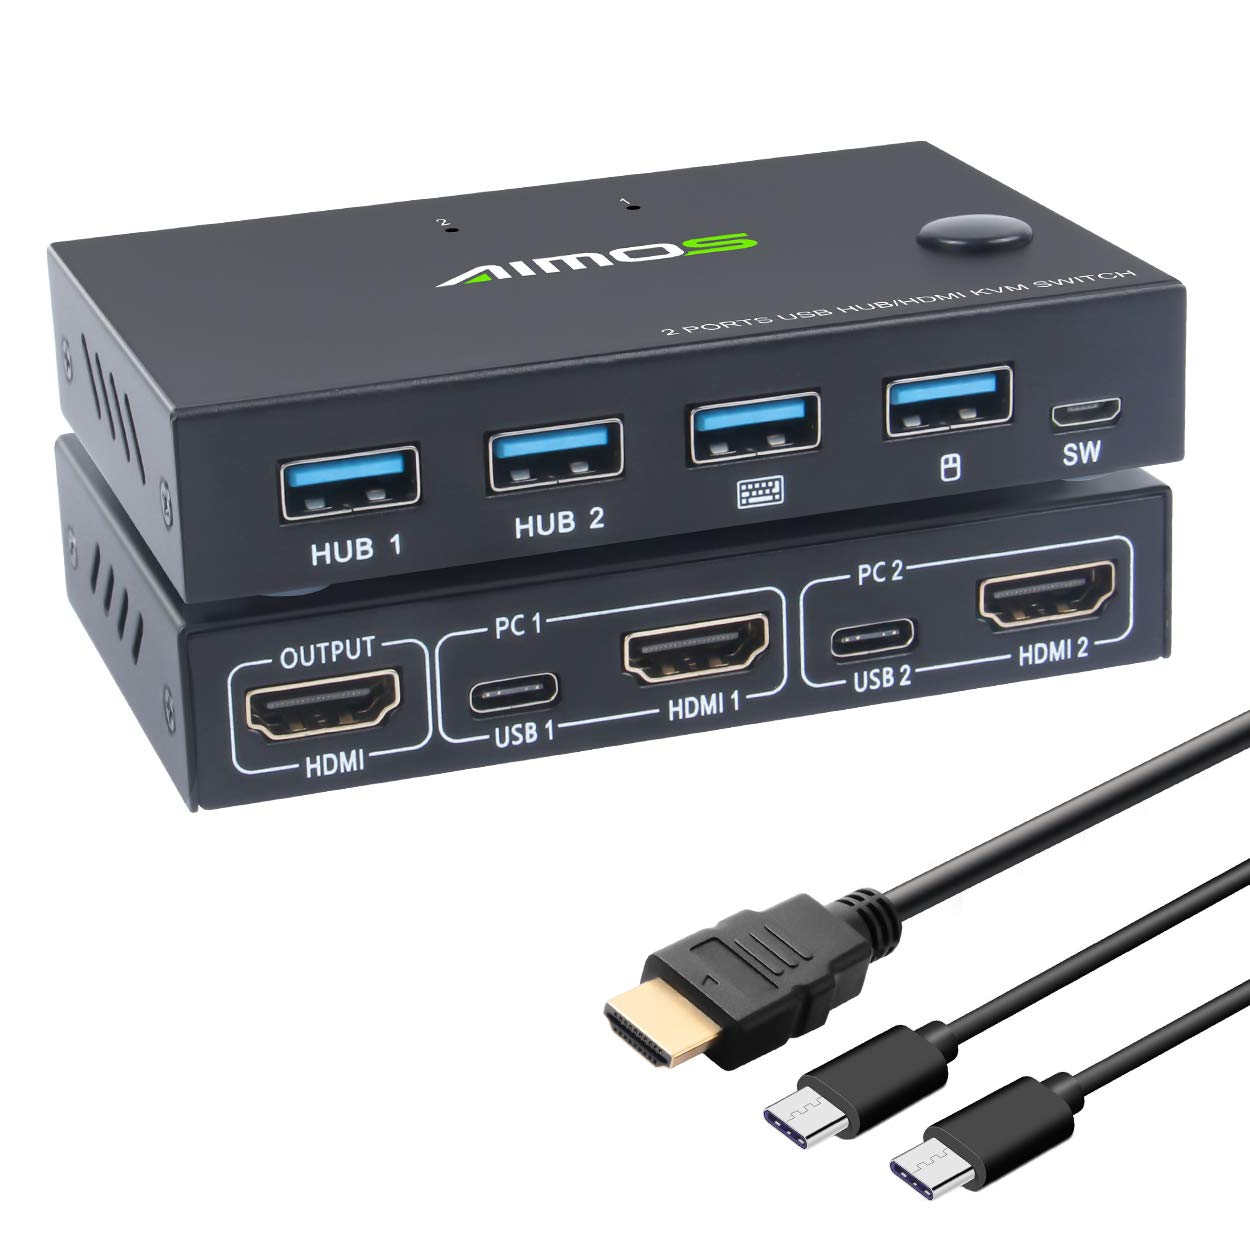 KVM Switch HDMI 2 Award Port Box Switches KCEVE and 4 Soldering Hu USB